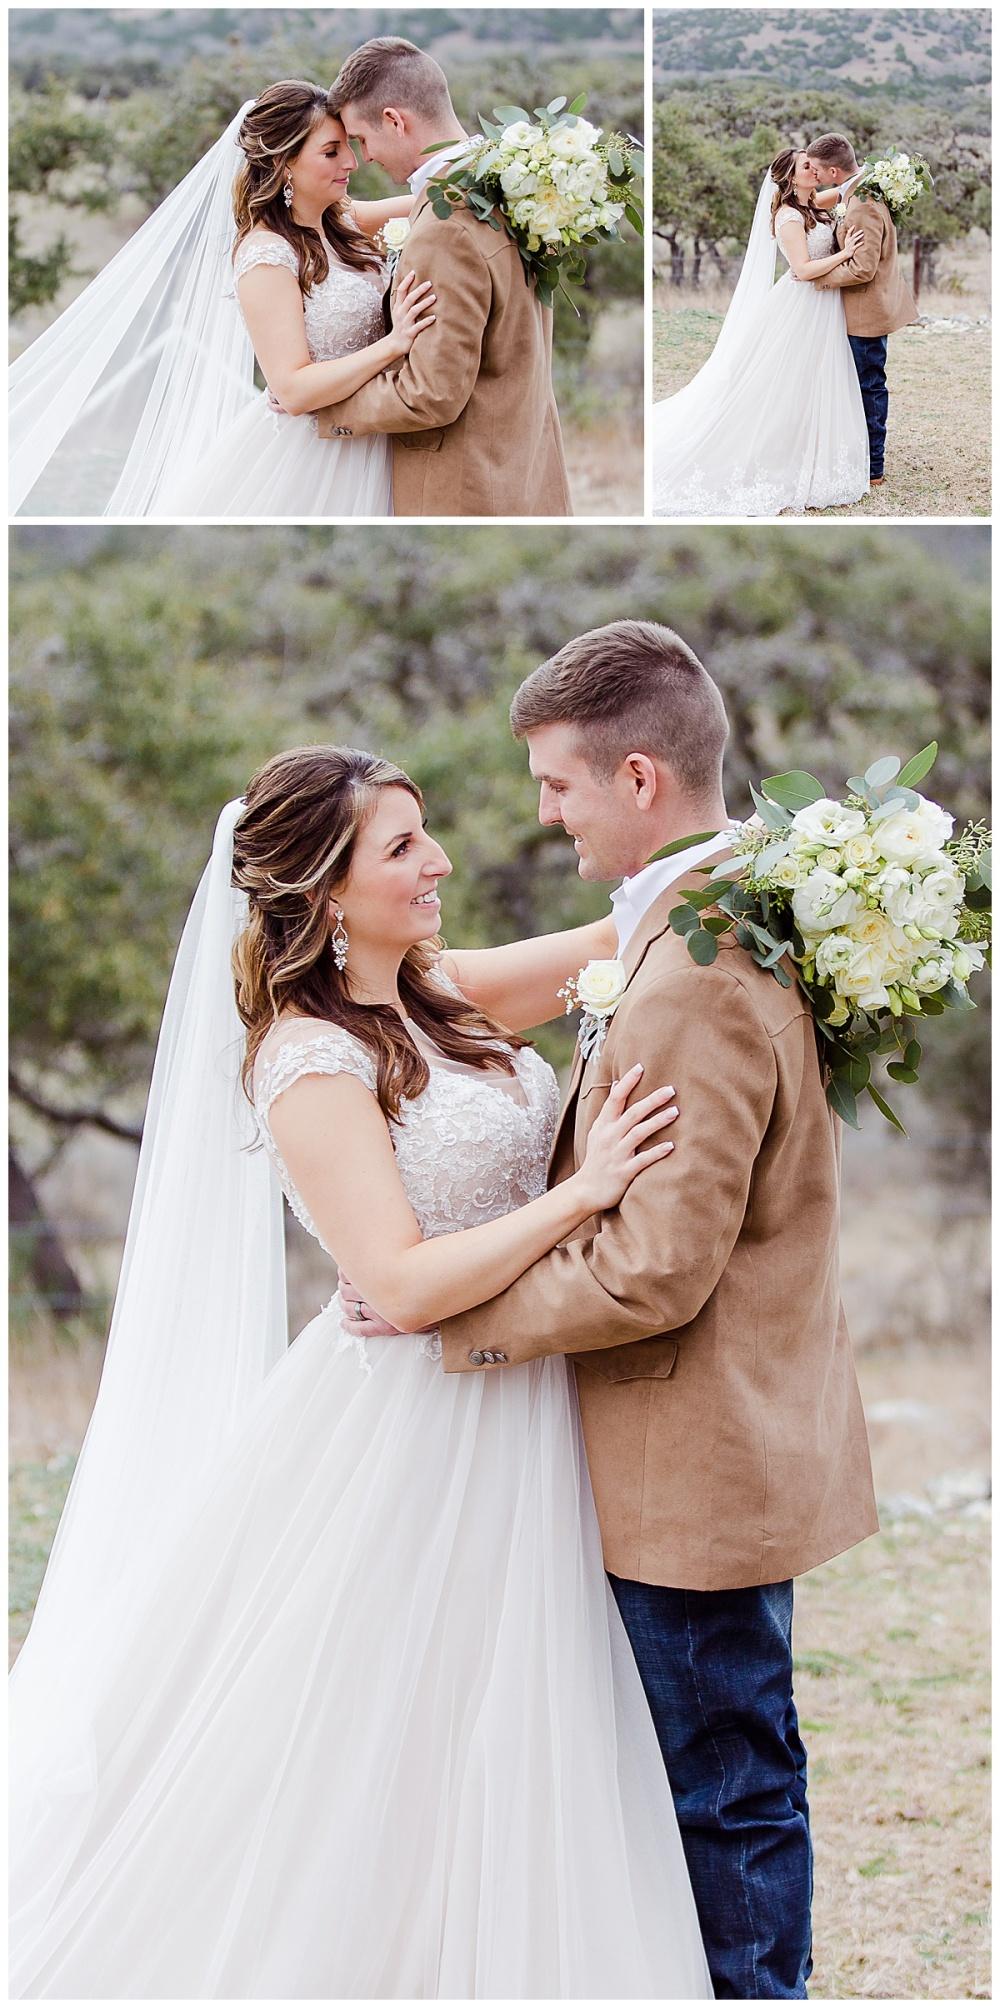 Wedding-Photographer-Texas-Hill-Country-Happy-H-Ranch-Comfor-Texas-Carly-Barton-Photography_0045.jpg